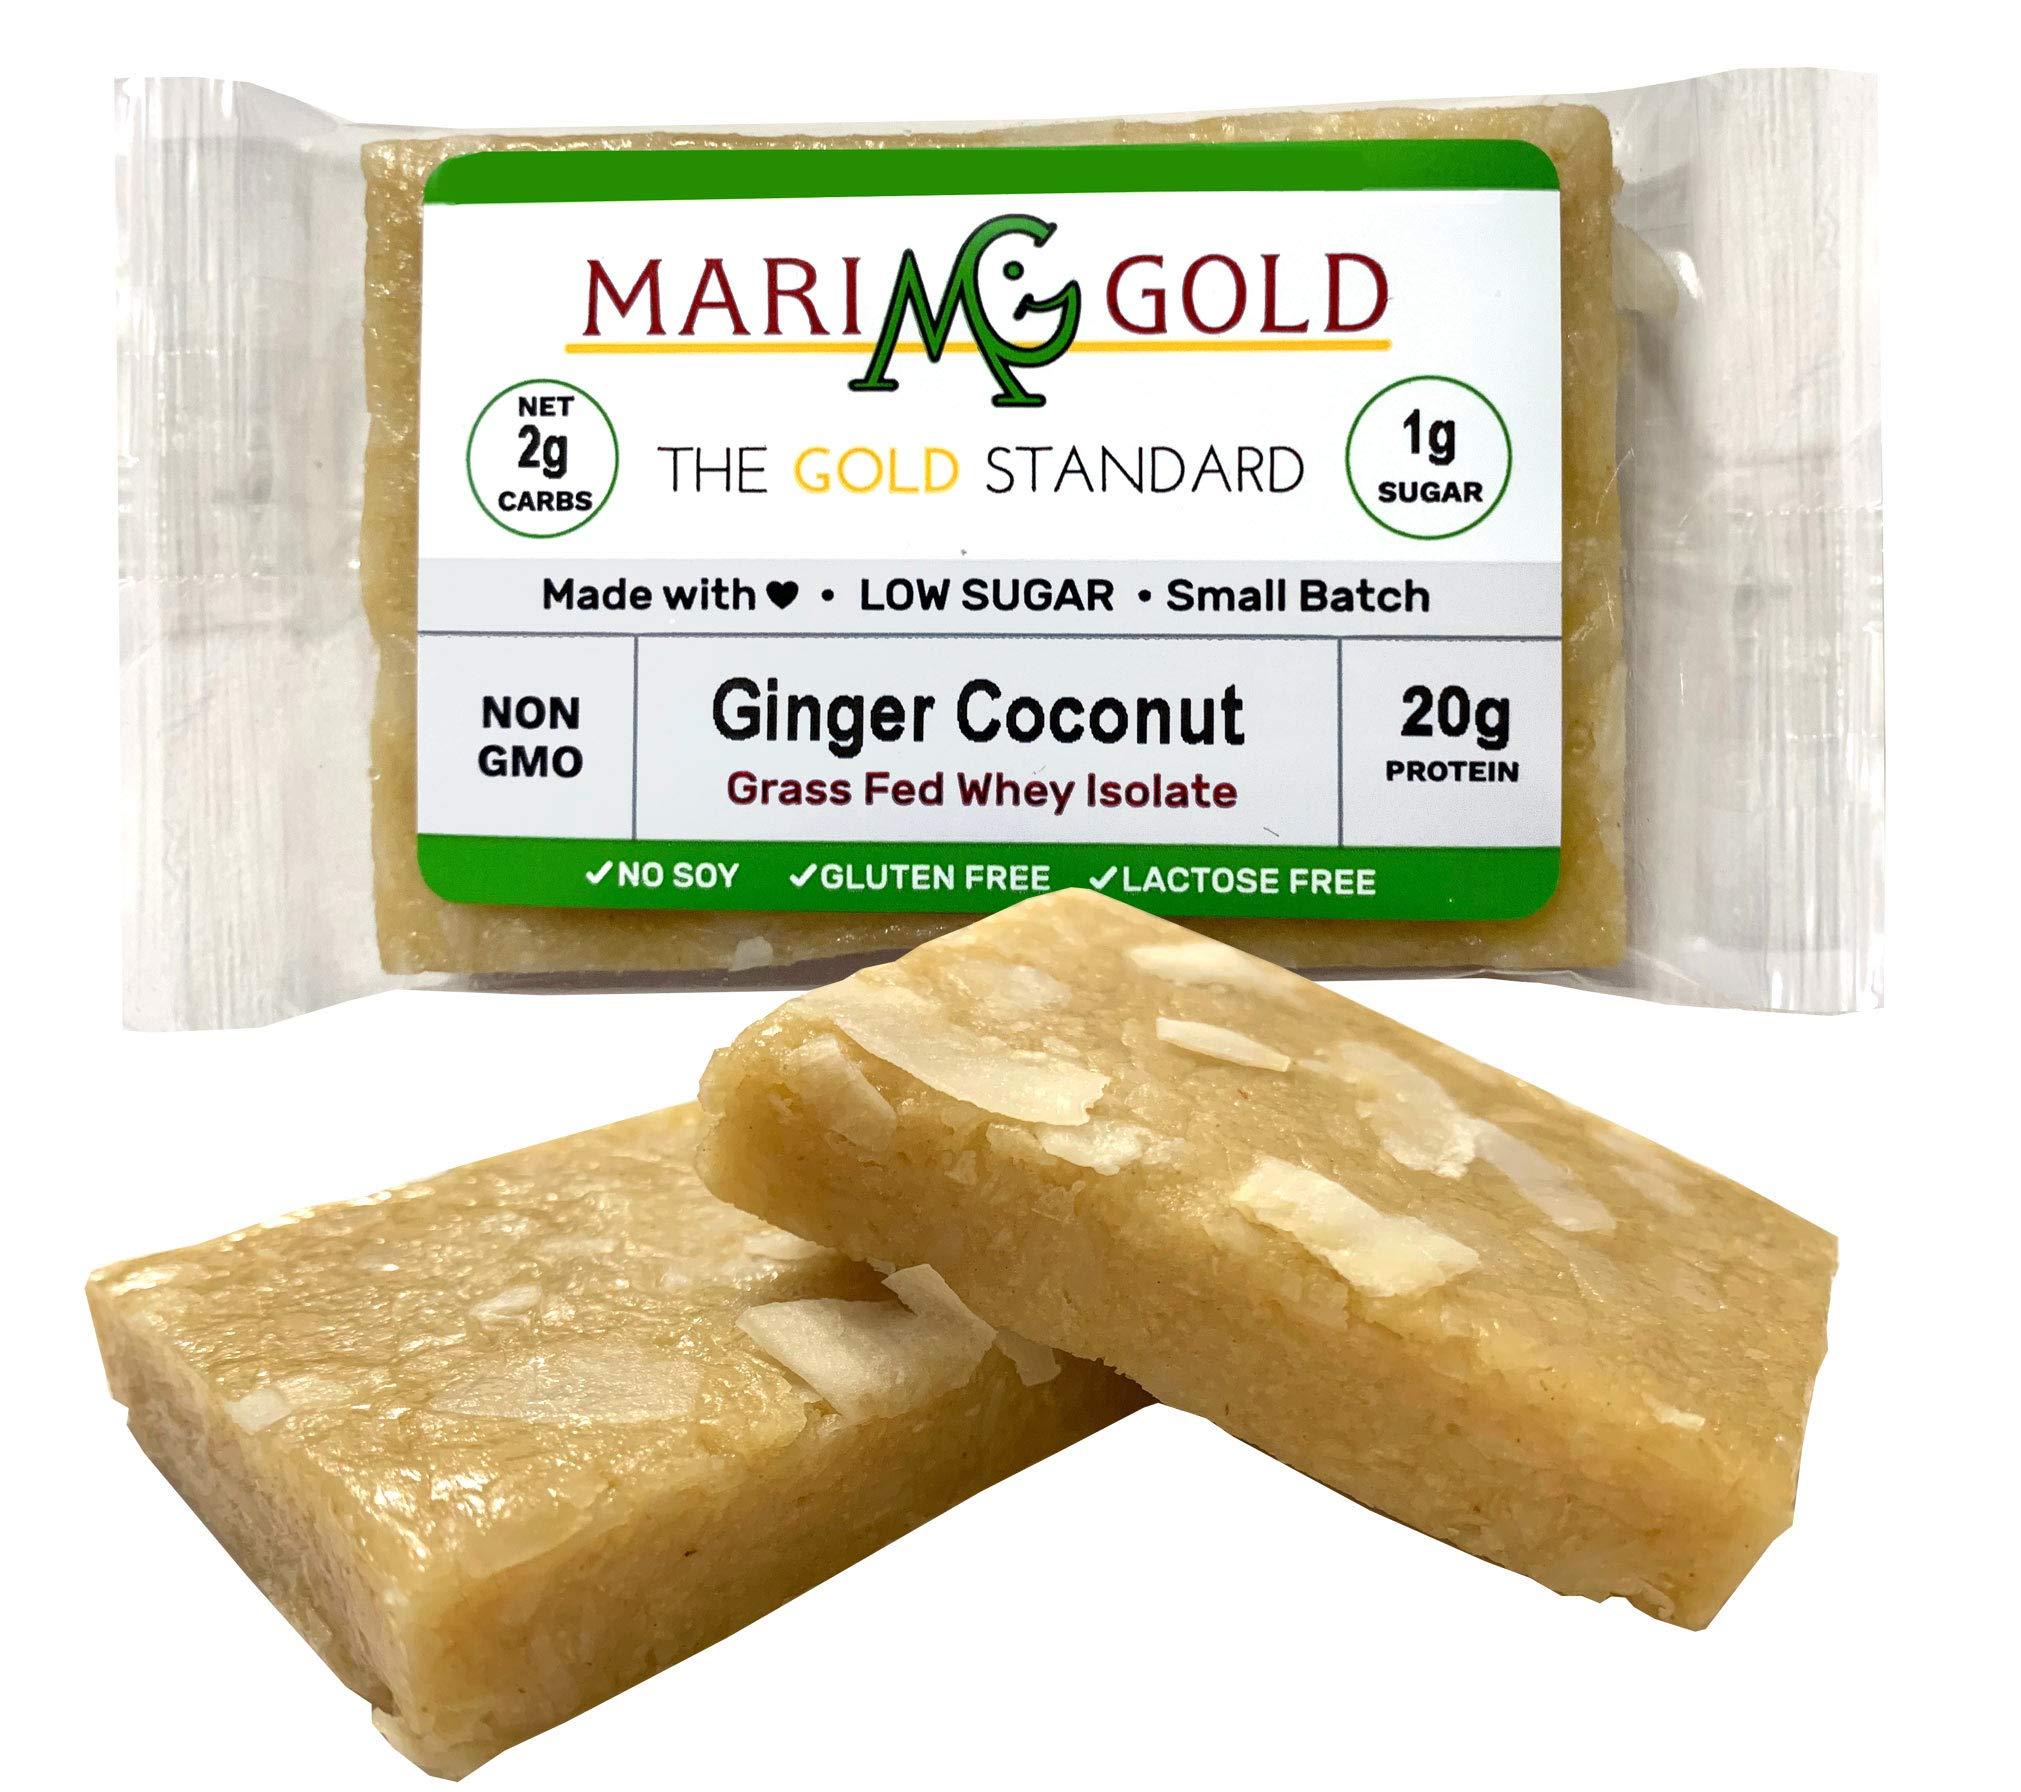 Keto (2-3 NET CARB) Protein Bar by MariGold - Amazing Taste Ketogenic Snacks - Organic Fats, 1 g Sugar, 21 g Protein GRASS FED Whey - Non GMO. Made Fresh, Ships Fresh. (12 bars) by MariGold Bars (Image #5)